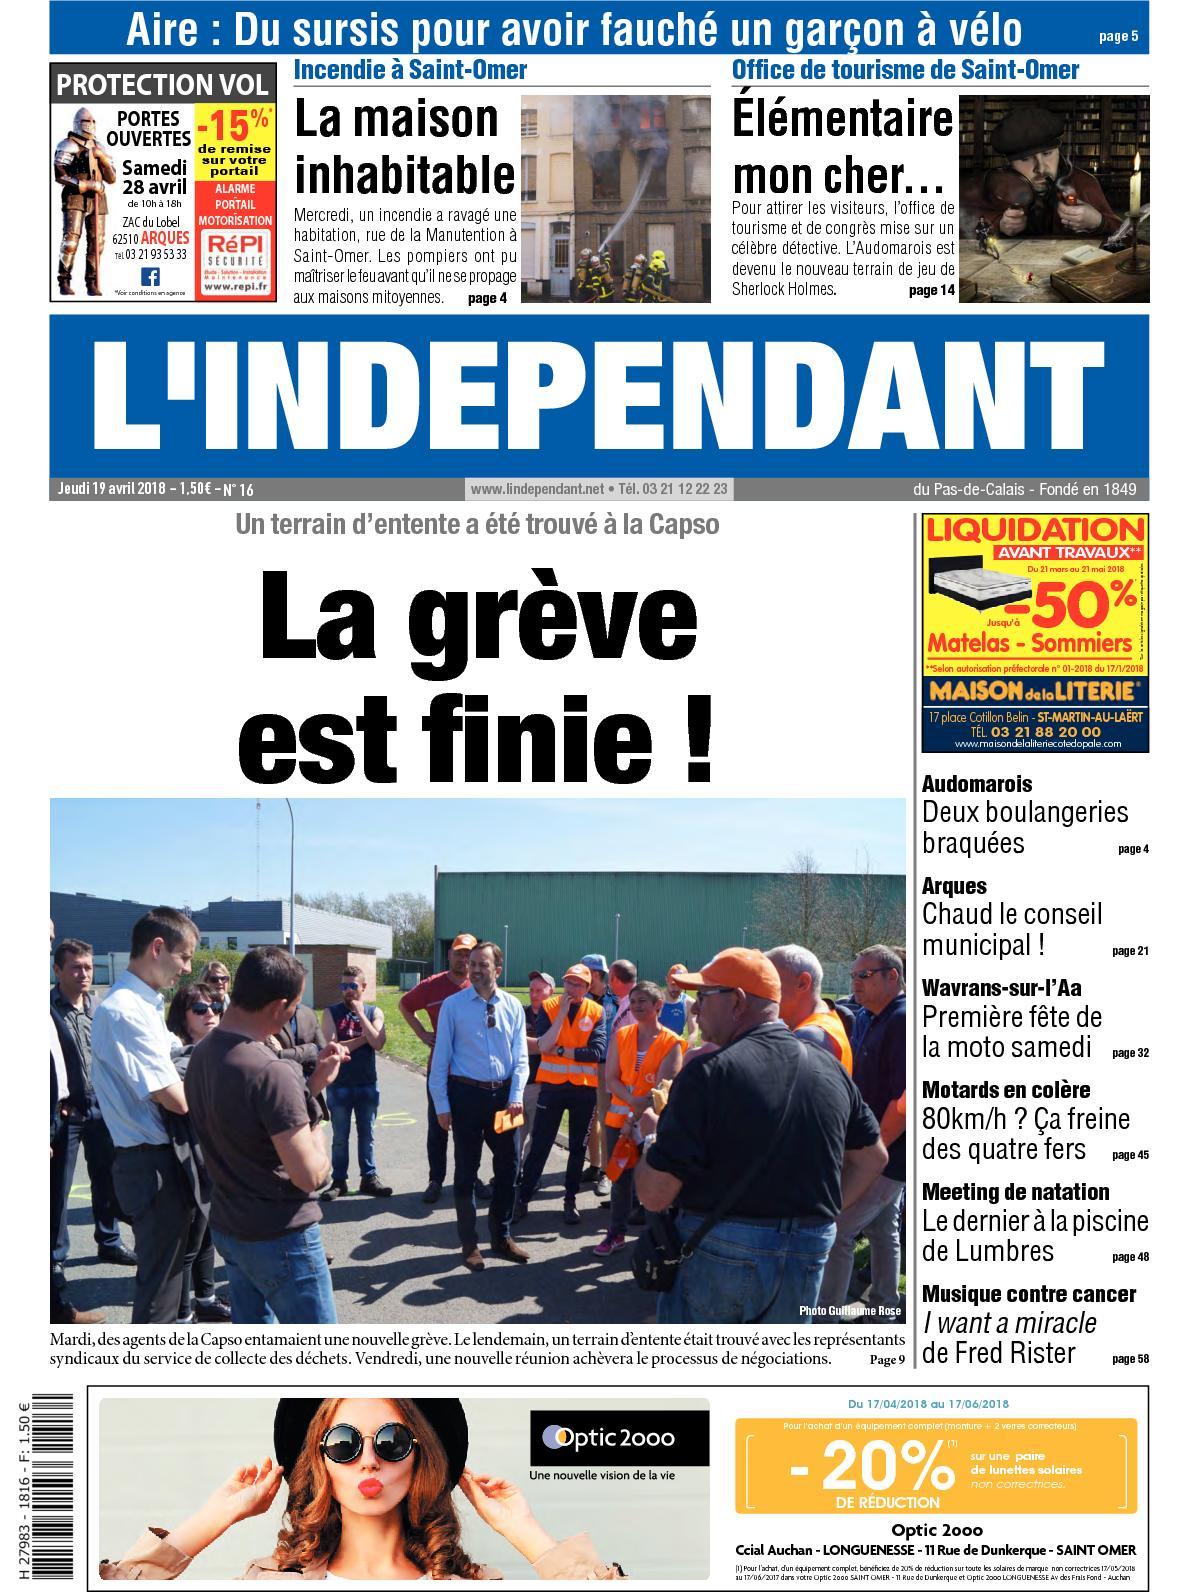 Calaméo - L indépendant Semaine 16 2018 d83a43b5b63a